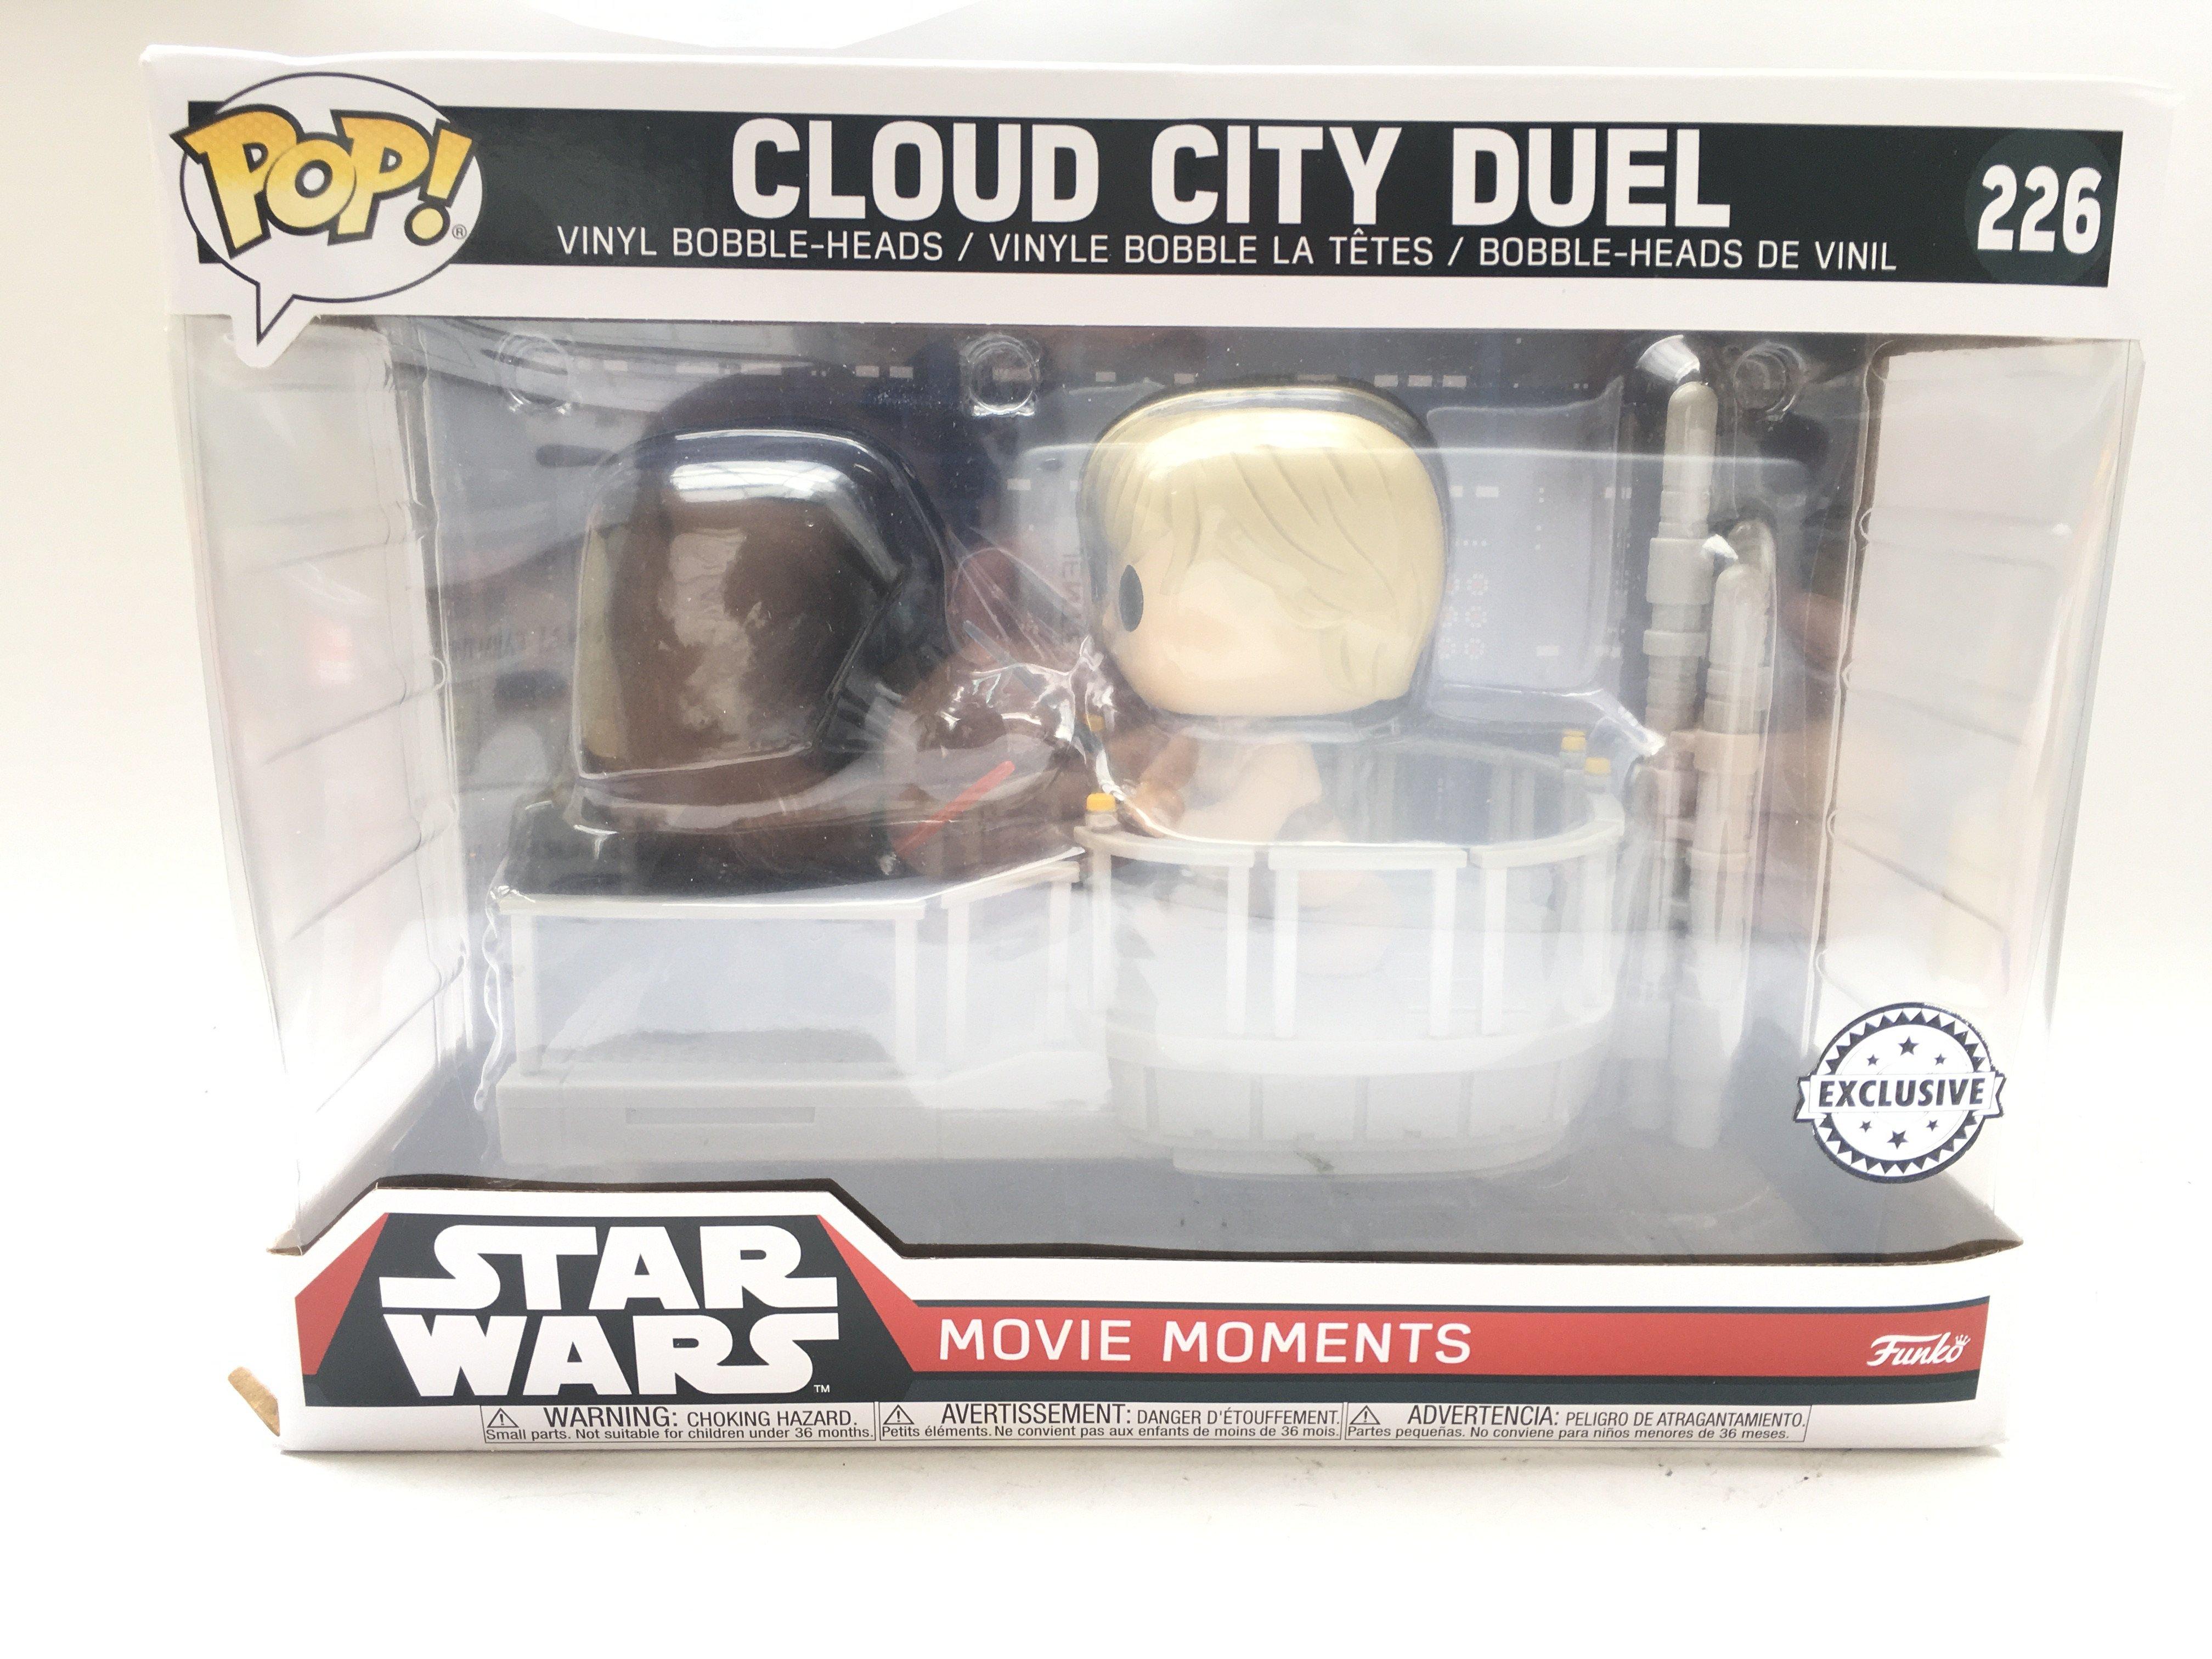 A Boxed Funko POP Star Wars Movie Moments Cloud Ci